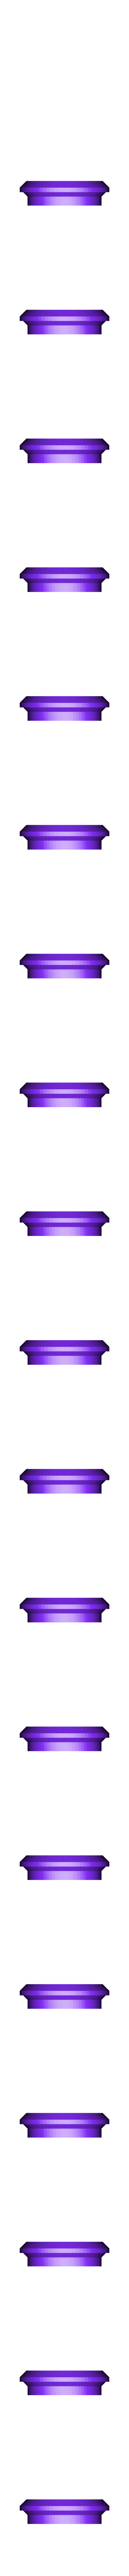 plateform_20mm_tube_cap.STL Download free STL file bungee launching plateform • 3D printing object, badassdrones